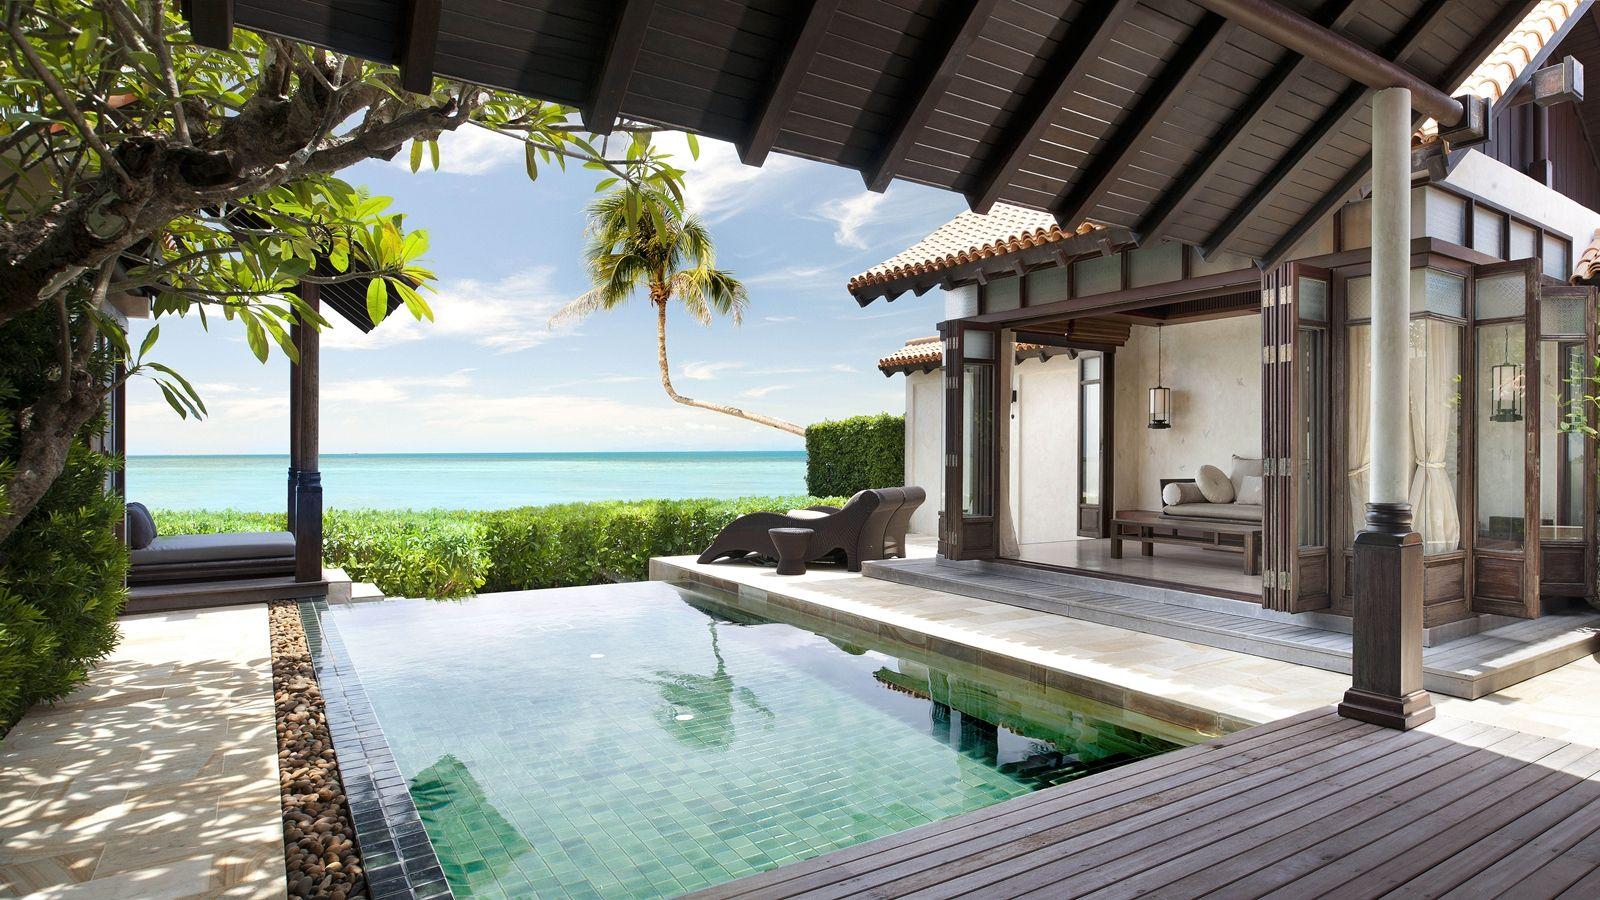 Ocean Front Pool Villa Spa, Resort spa, Hotels, resorts